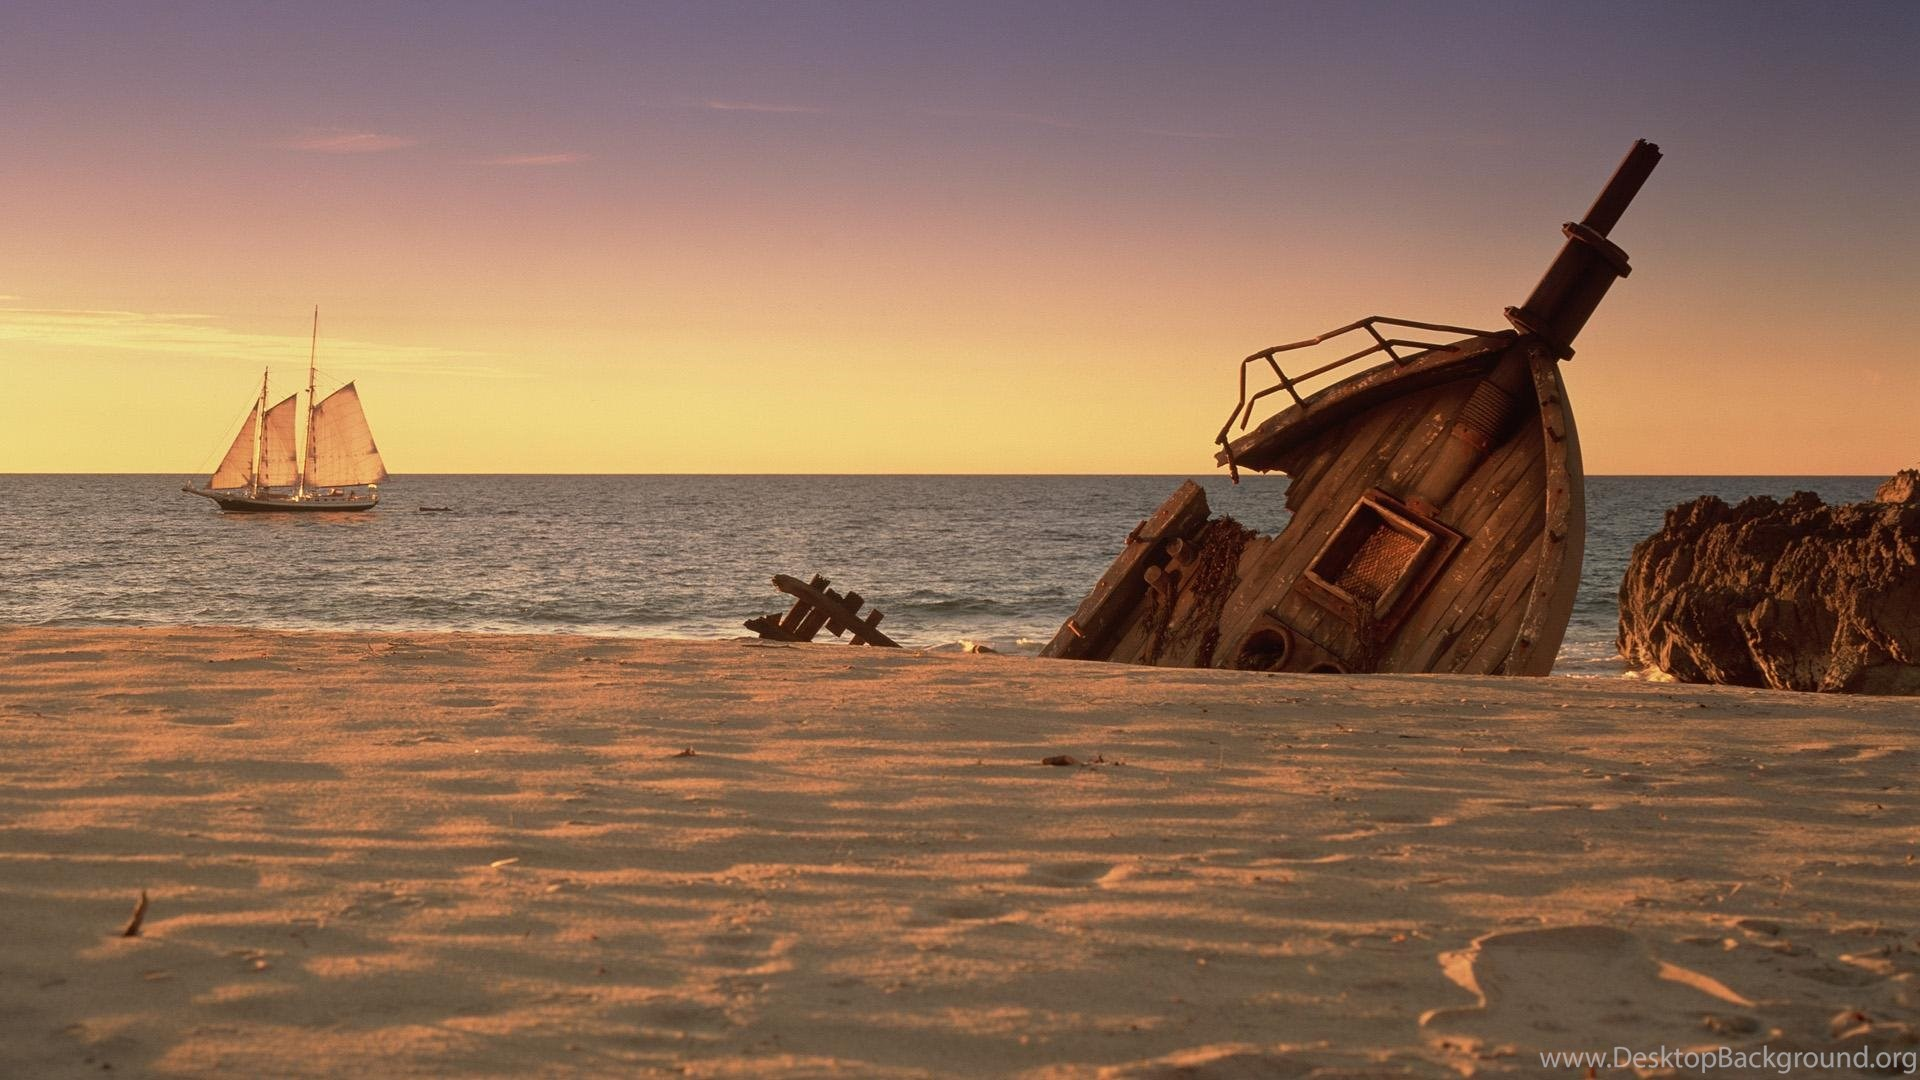 Sailing By A Shipwreck HD Wallpaper Get It Now Desktop Background